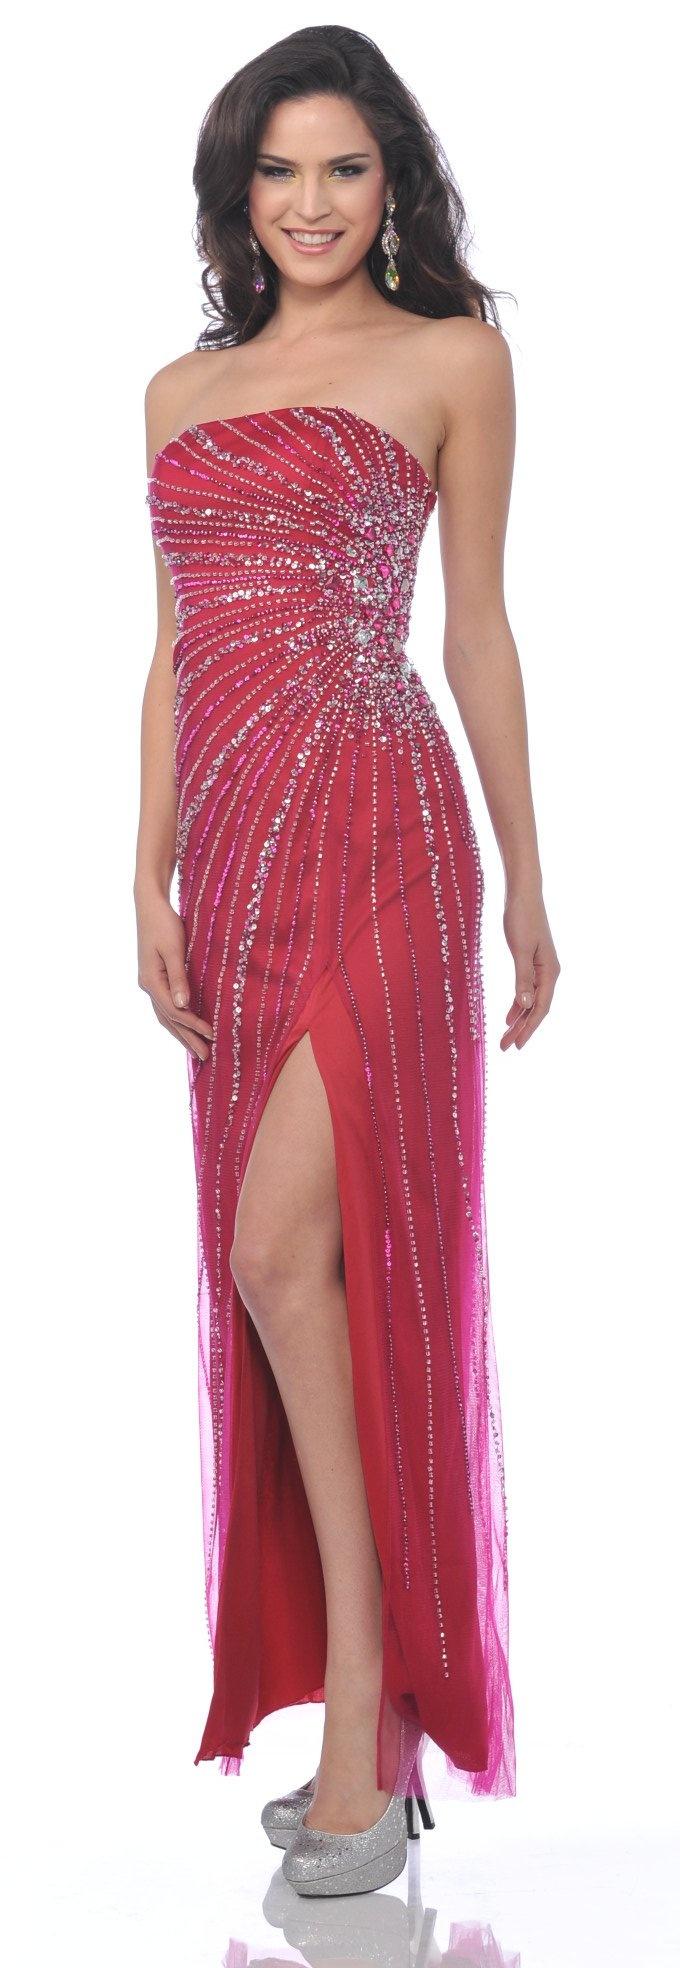 Strapless Fuchsia Rhinestone Jewel Long Formal Dress Sexy Front Slit $297.99